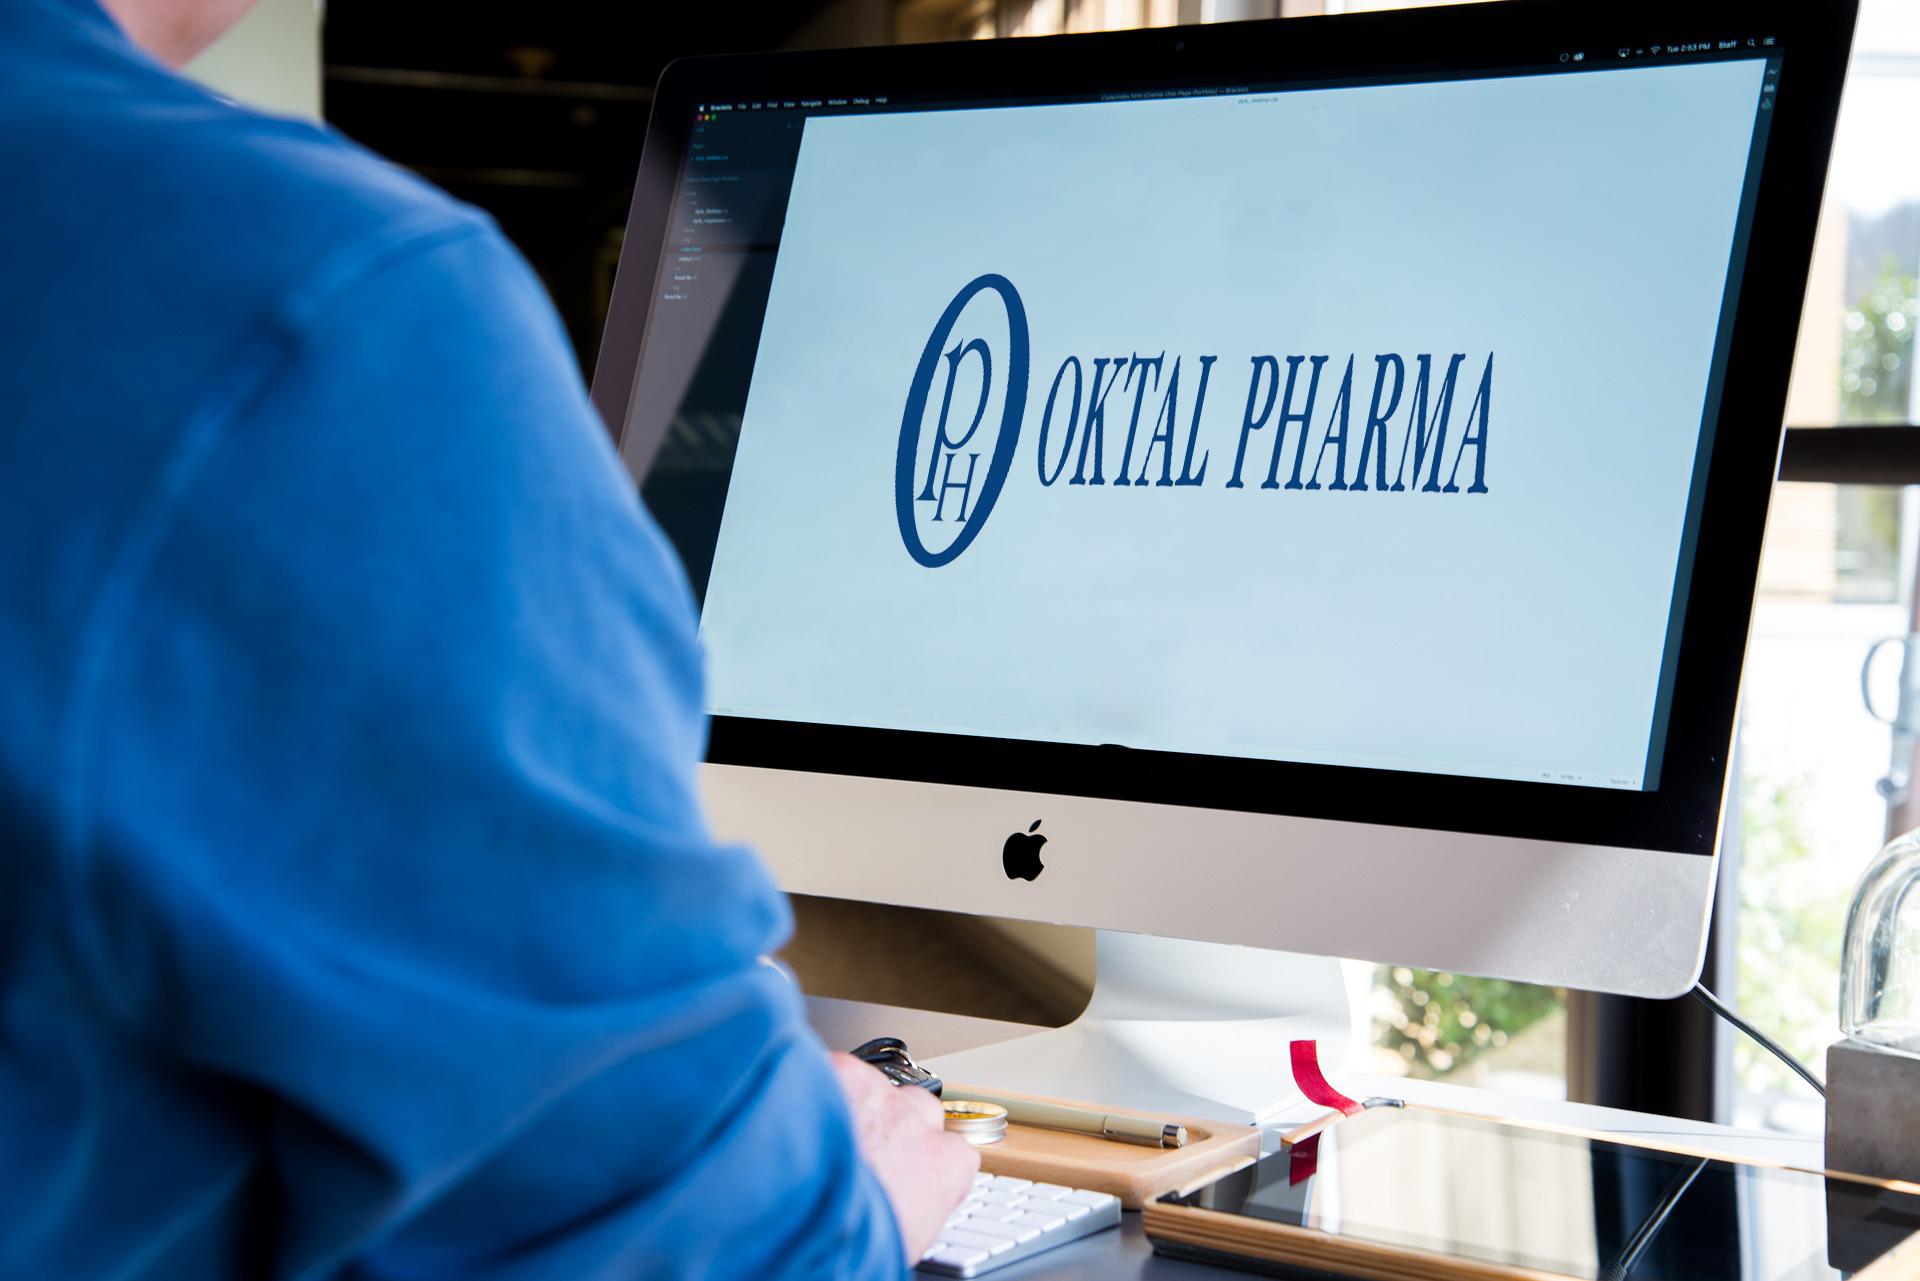 OKTAL PHARMA – new project on the way